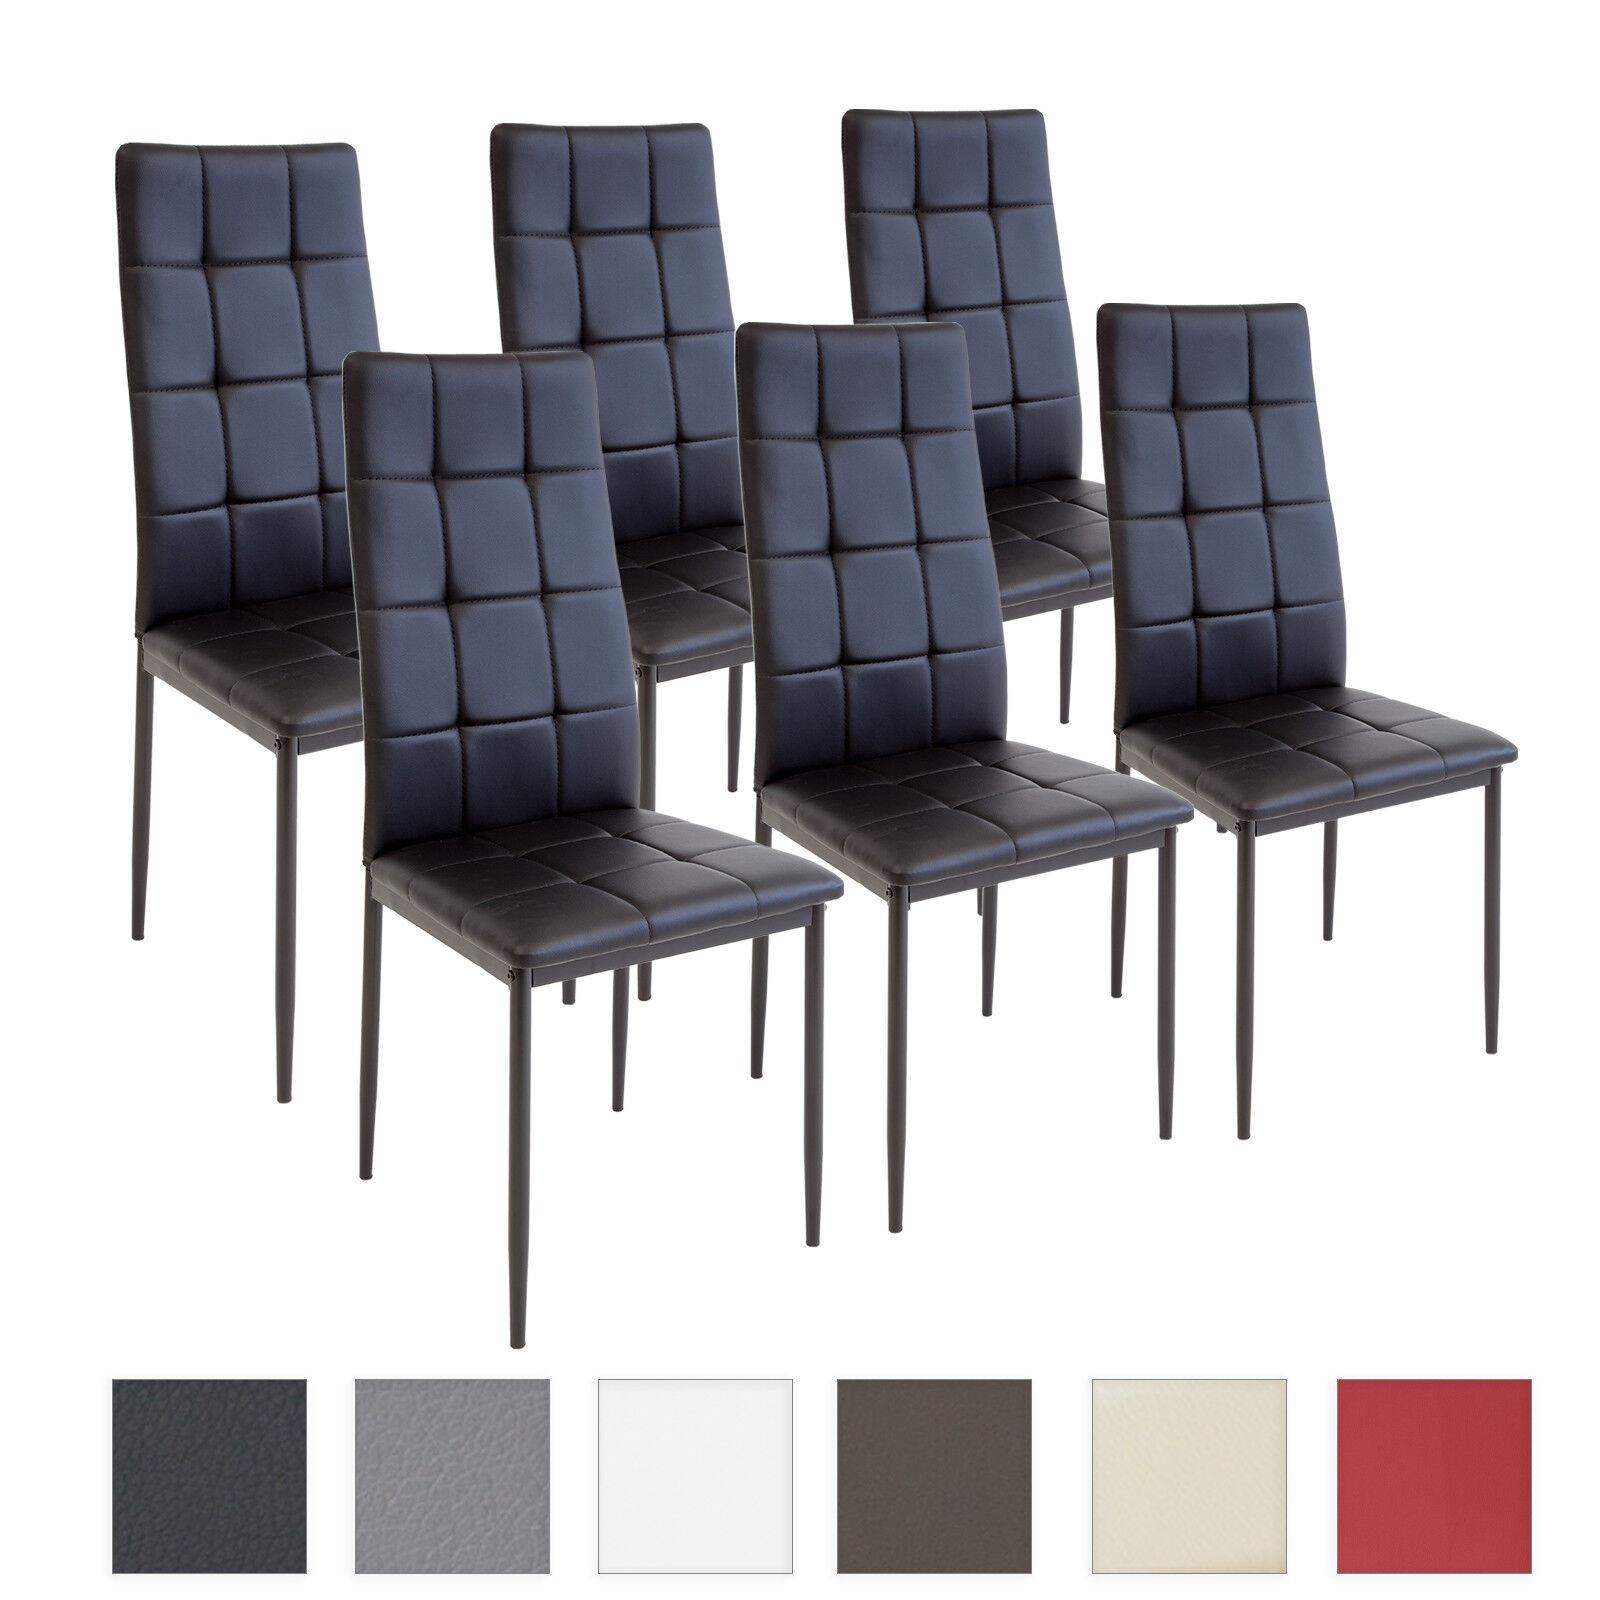 Esszimmerstühle RIMINI - Sets wählbar - Esszimmerstuhl Küchenstuhl Stuhl Stühle